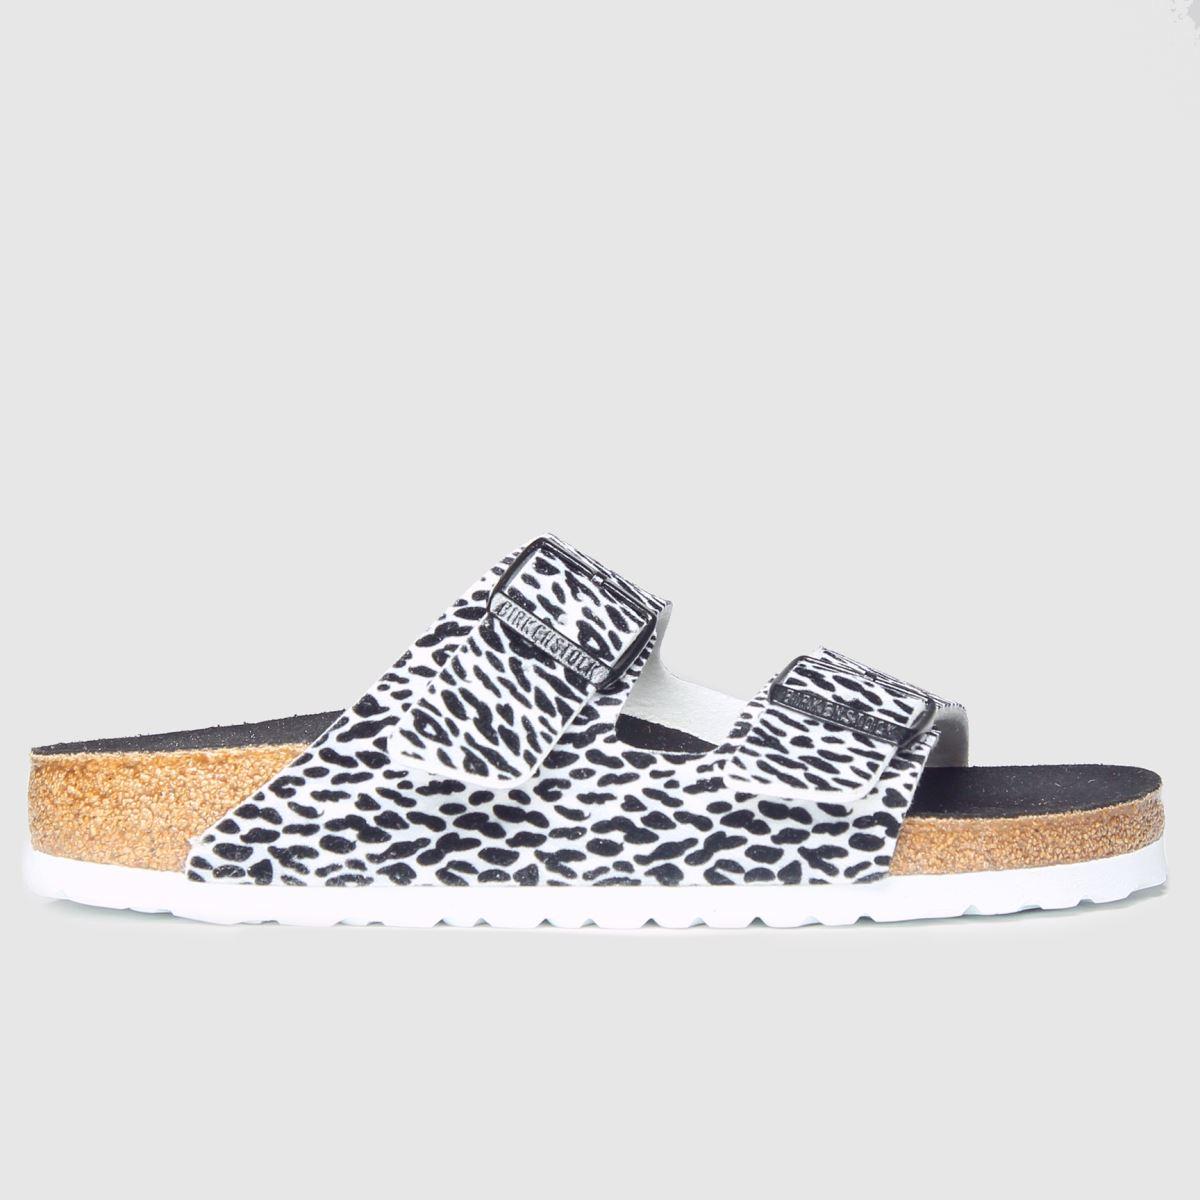 Birkenstock White & Black Arizona Sandals